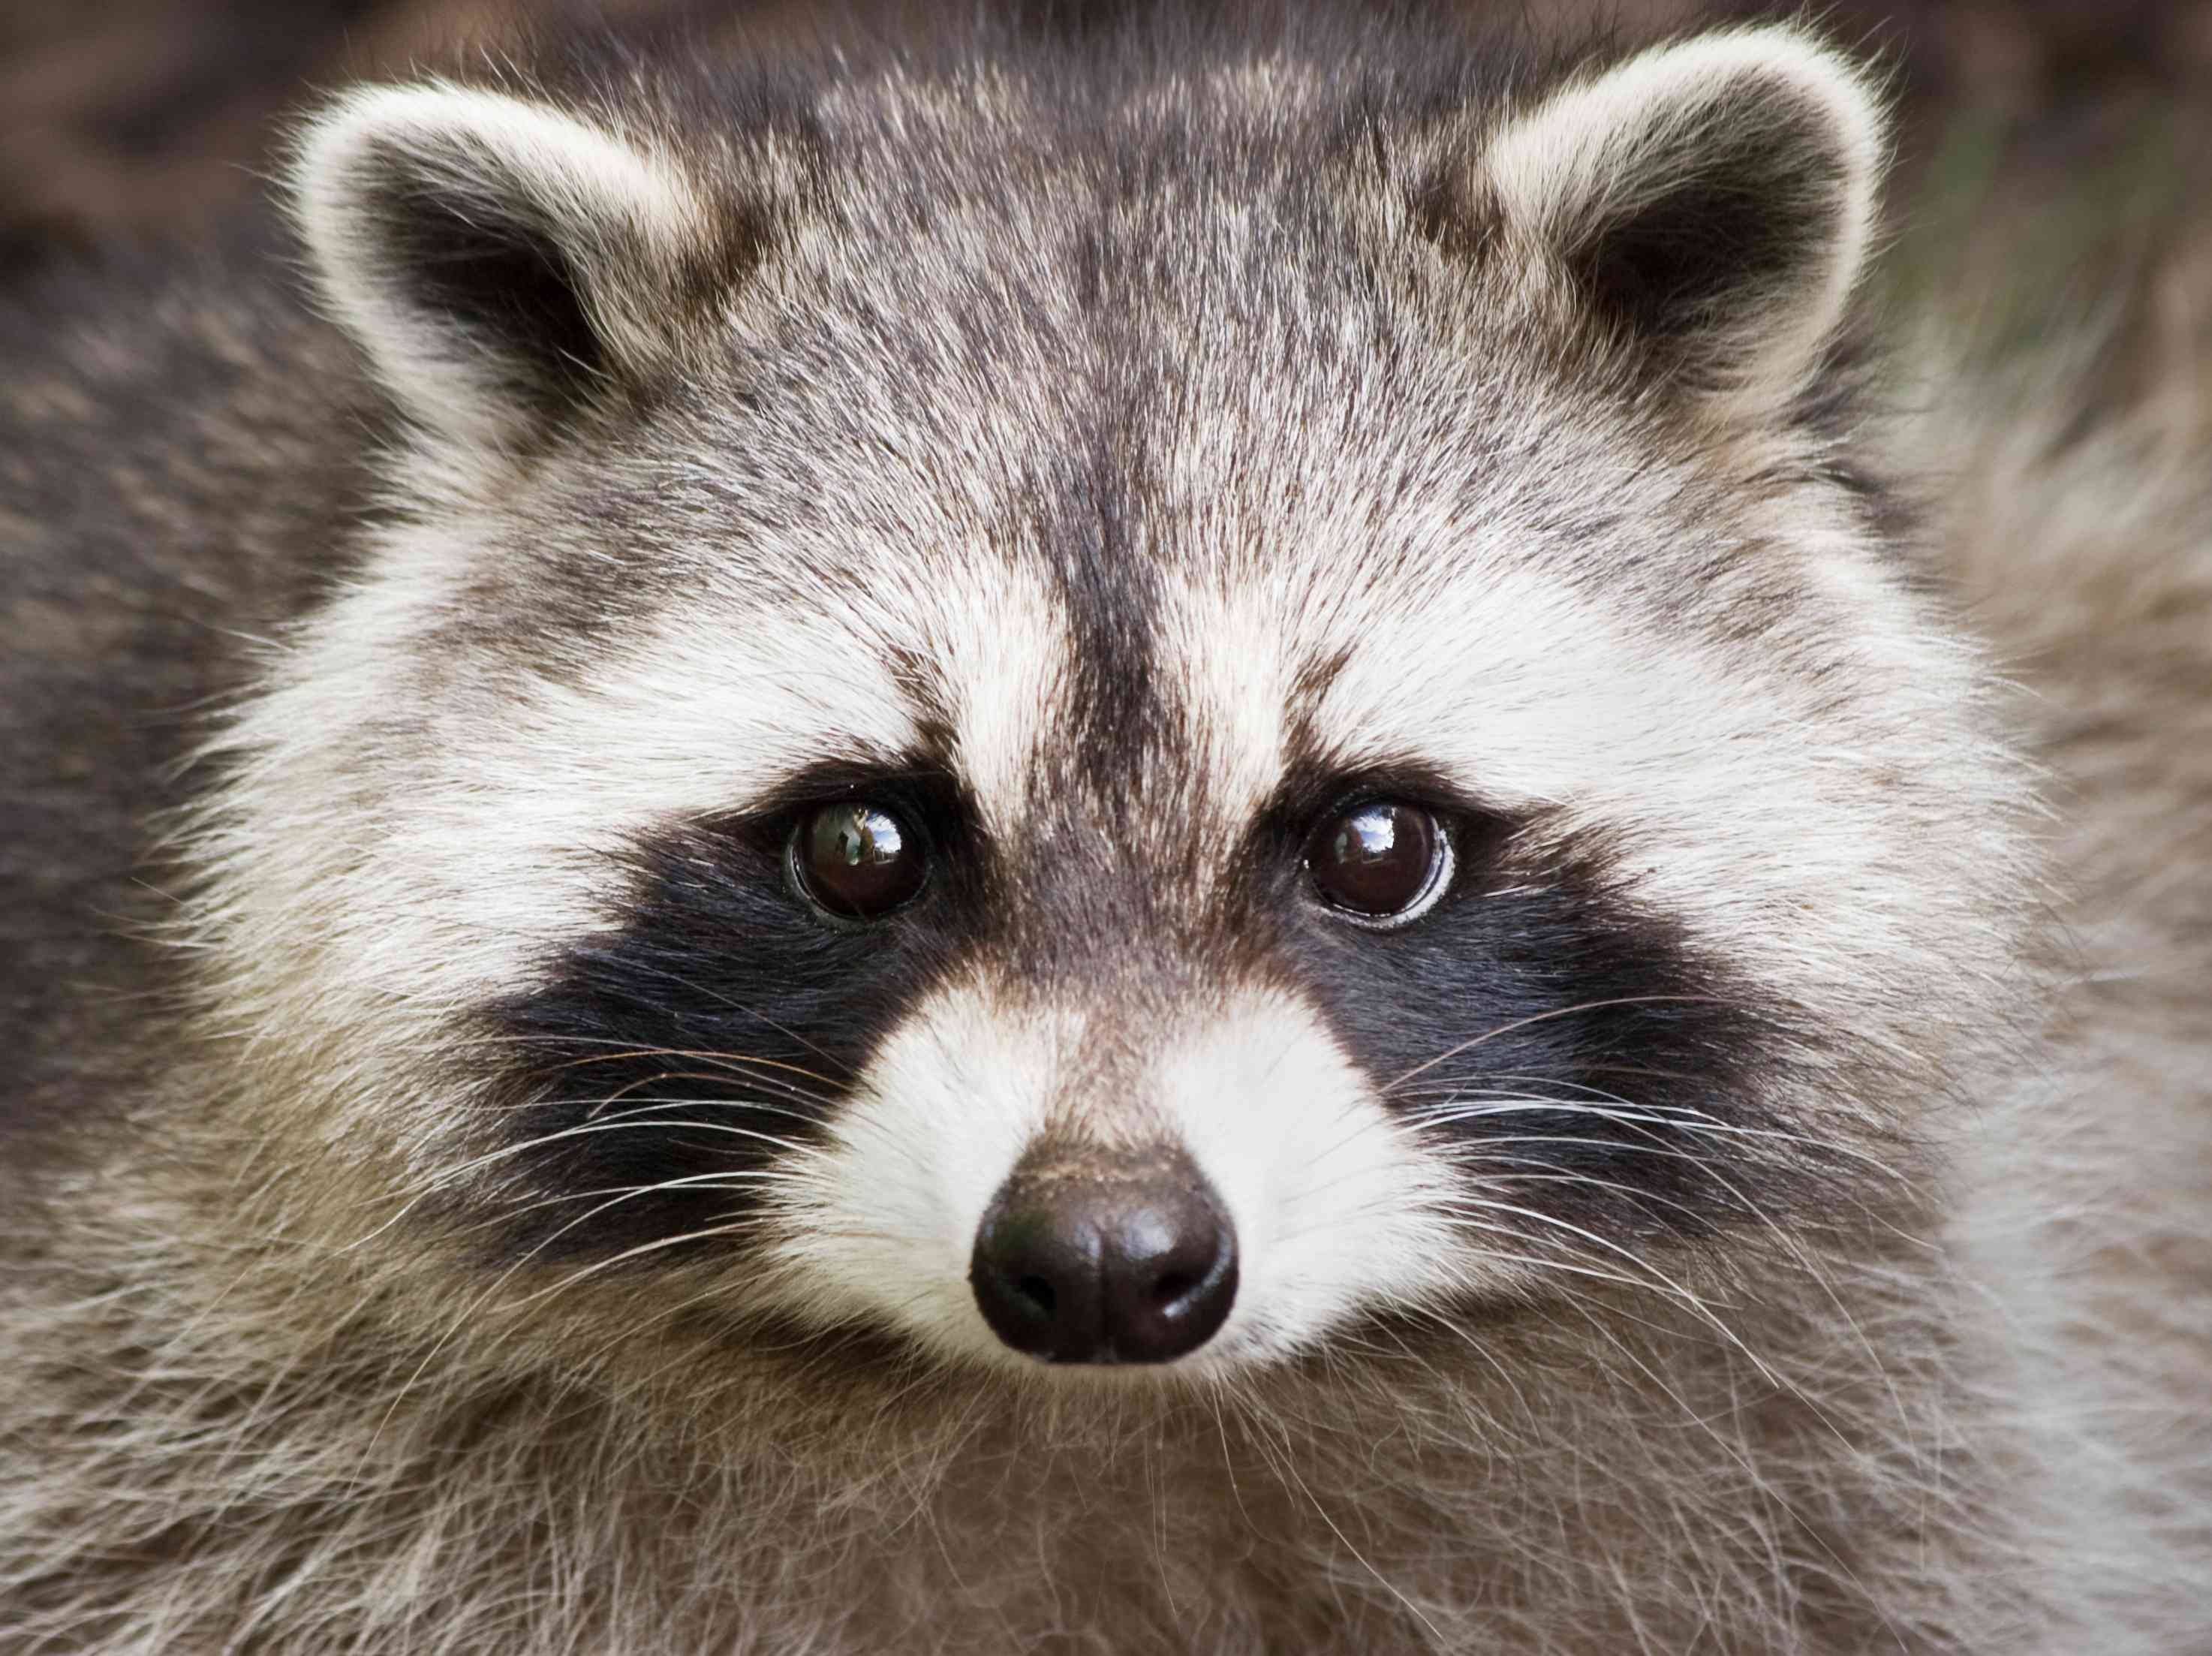 Close up of a cute raccoon face